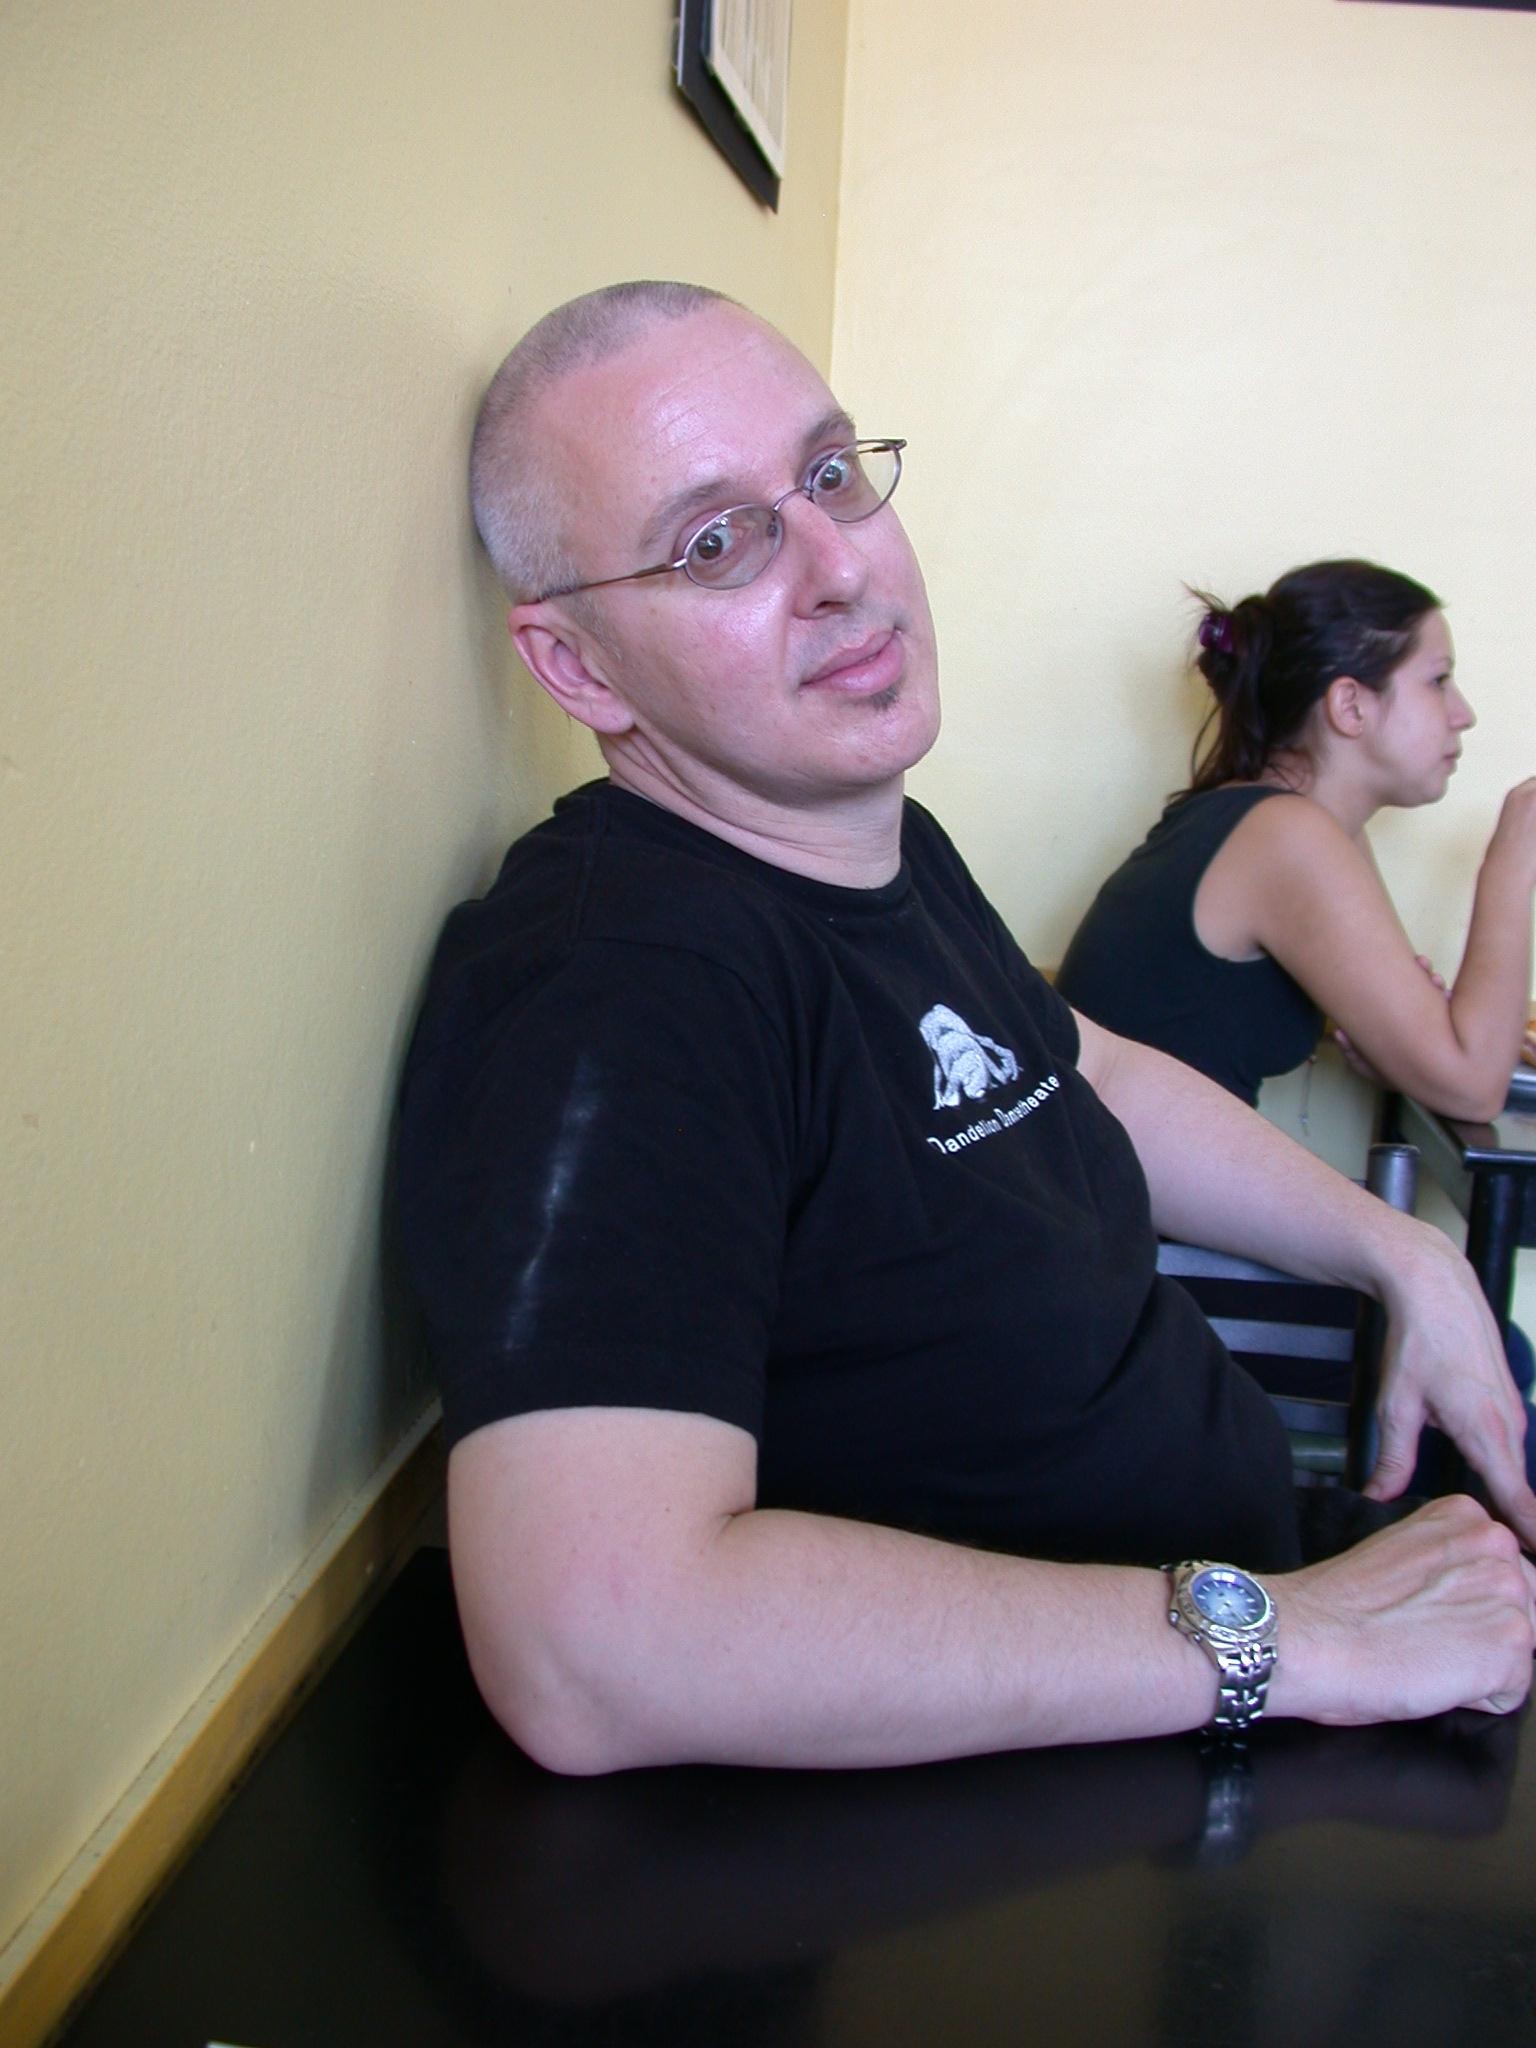 Jim e Sparklepants, Cafe de las Madres, Buenos Aires, Argentina